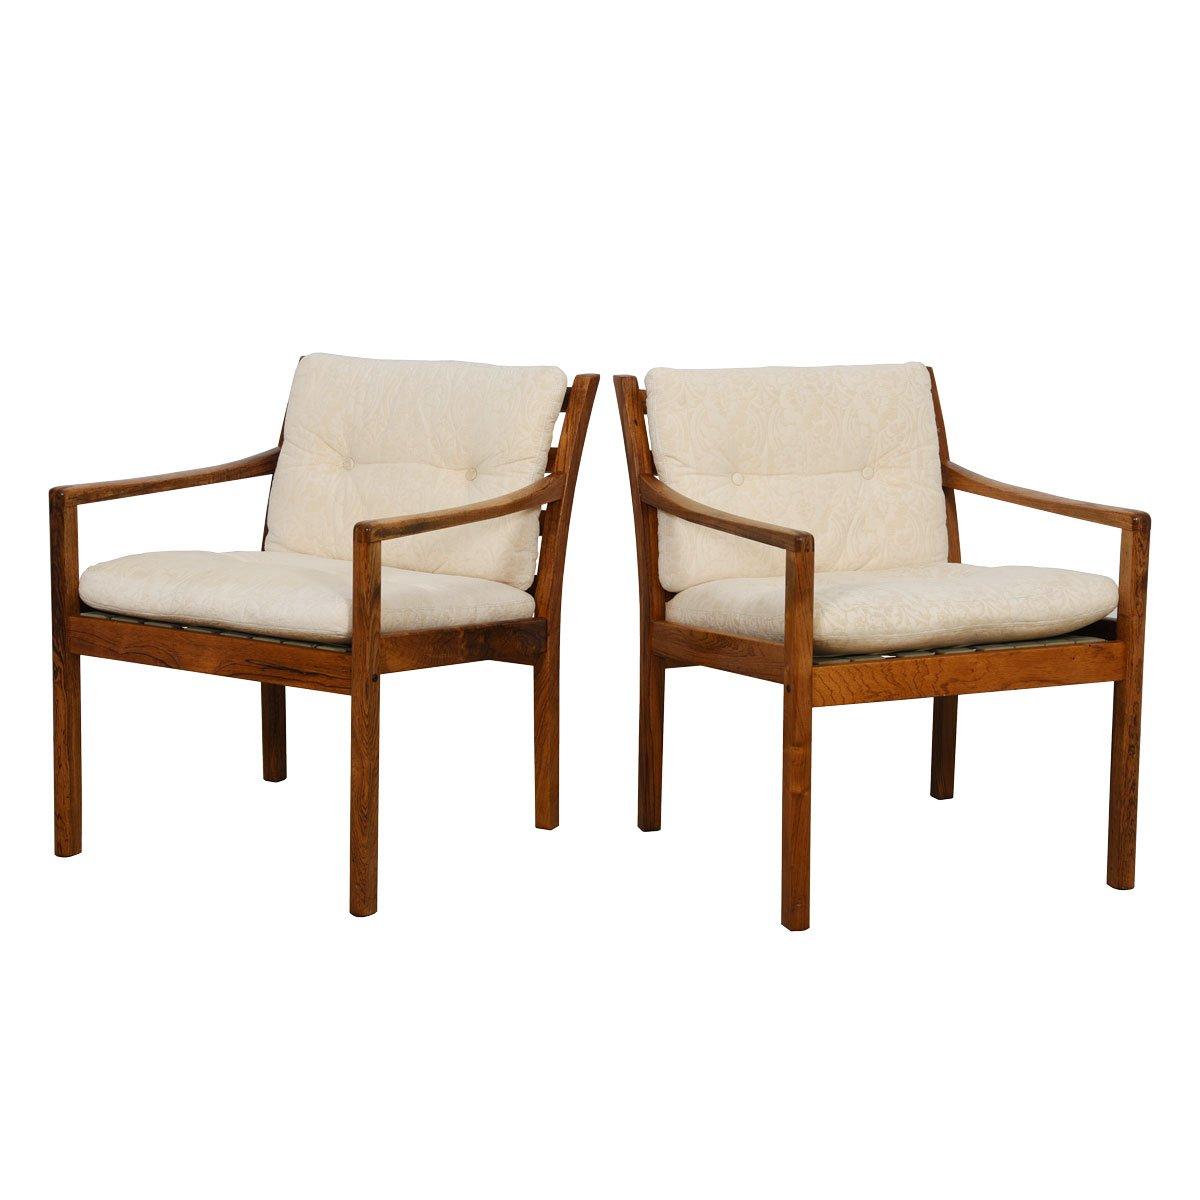 Pair of danish modern rosewood lounge chairs